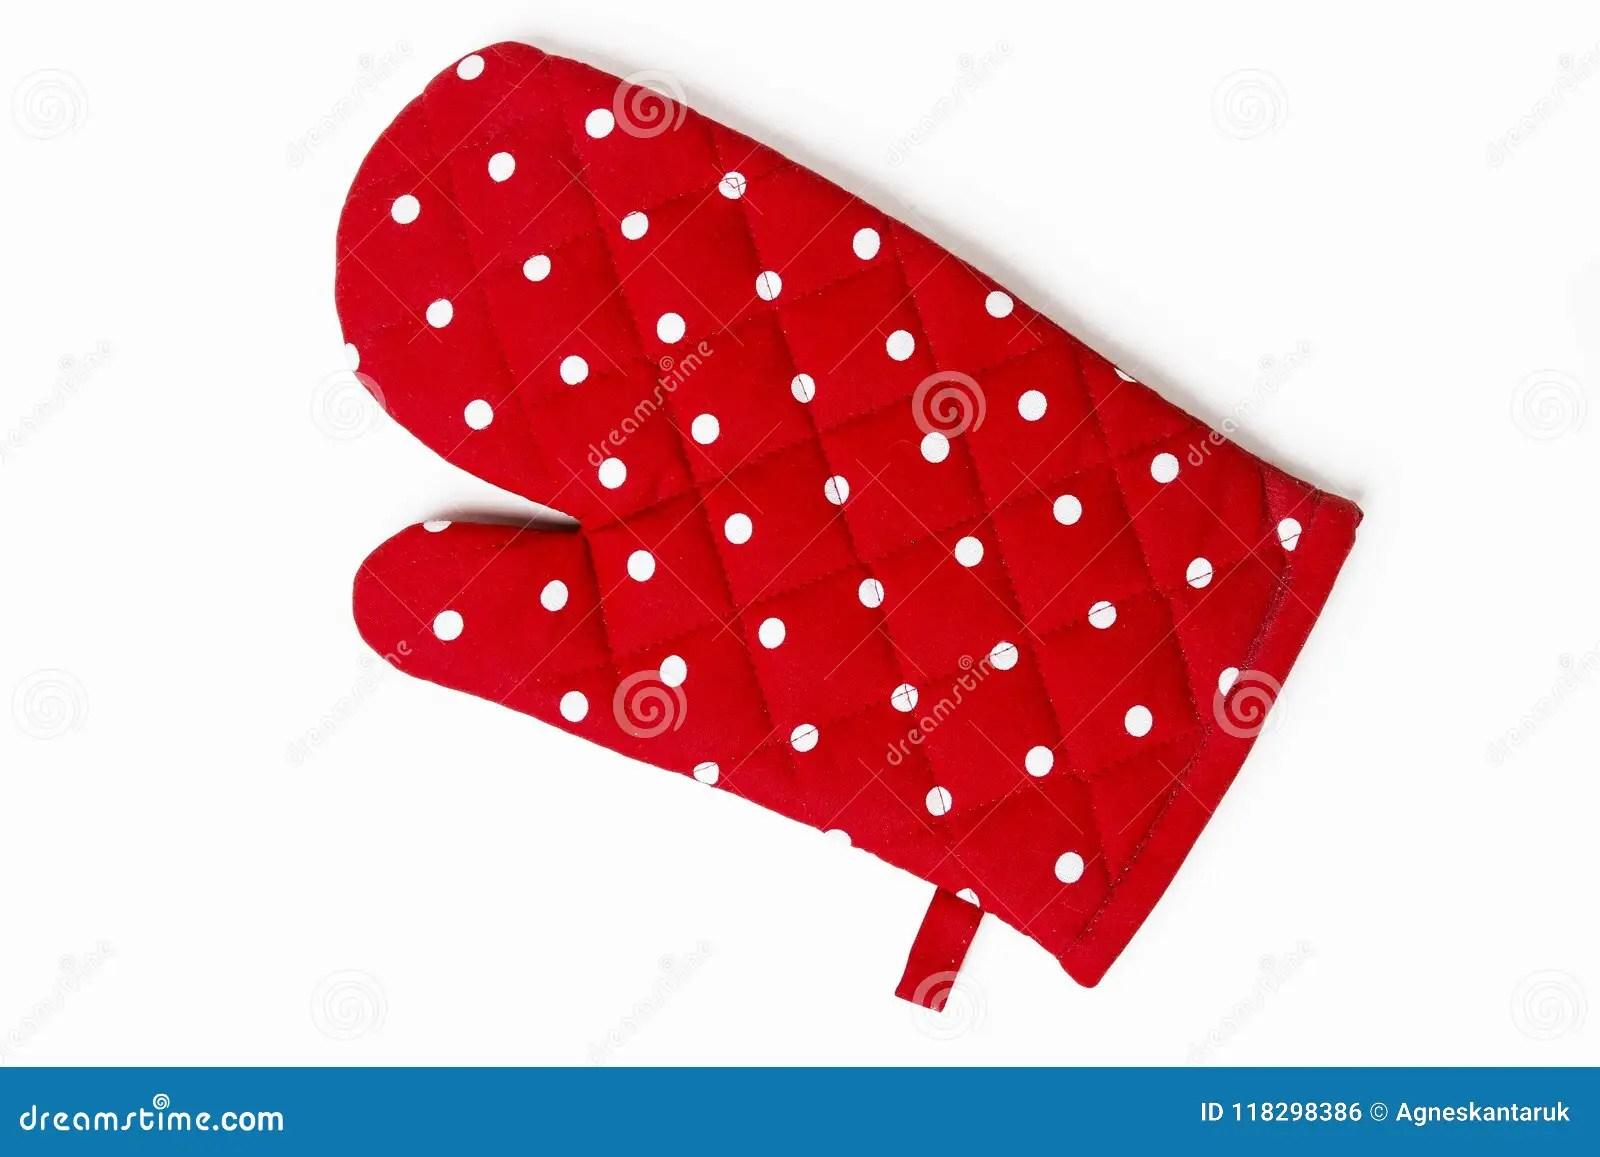 kitchen gloves lowes faucets delta 红色被加点的厨房手套库存照片 图片包括有葡萄酒 对比 生动 厨具 红色被加点的厨房手套